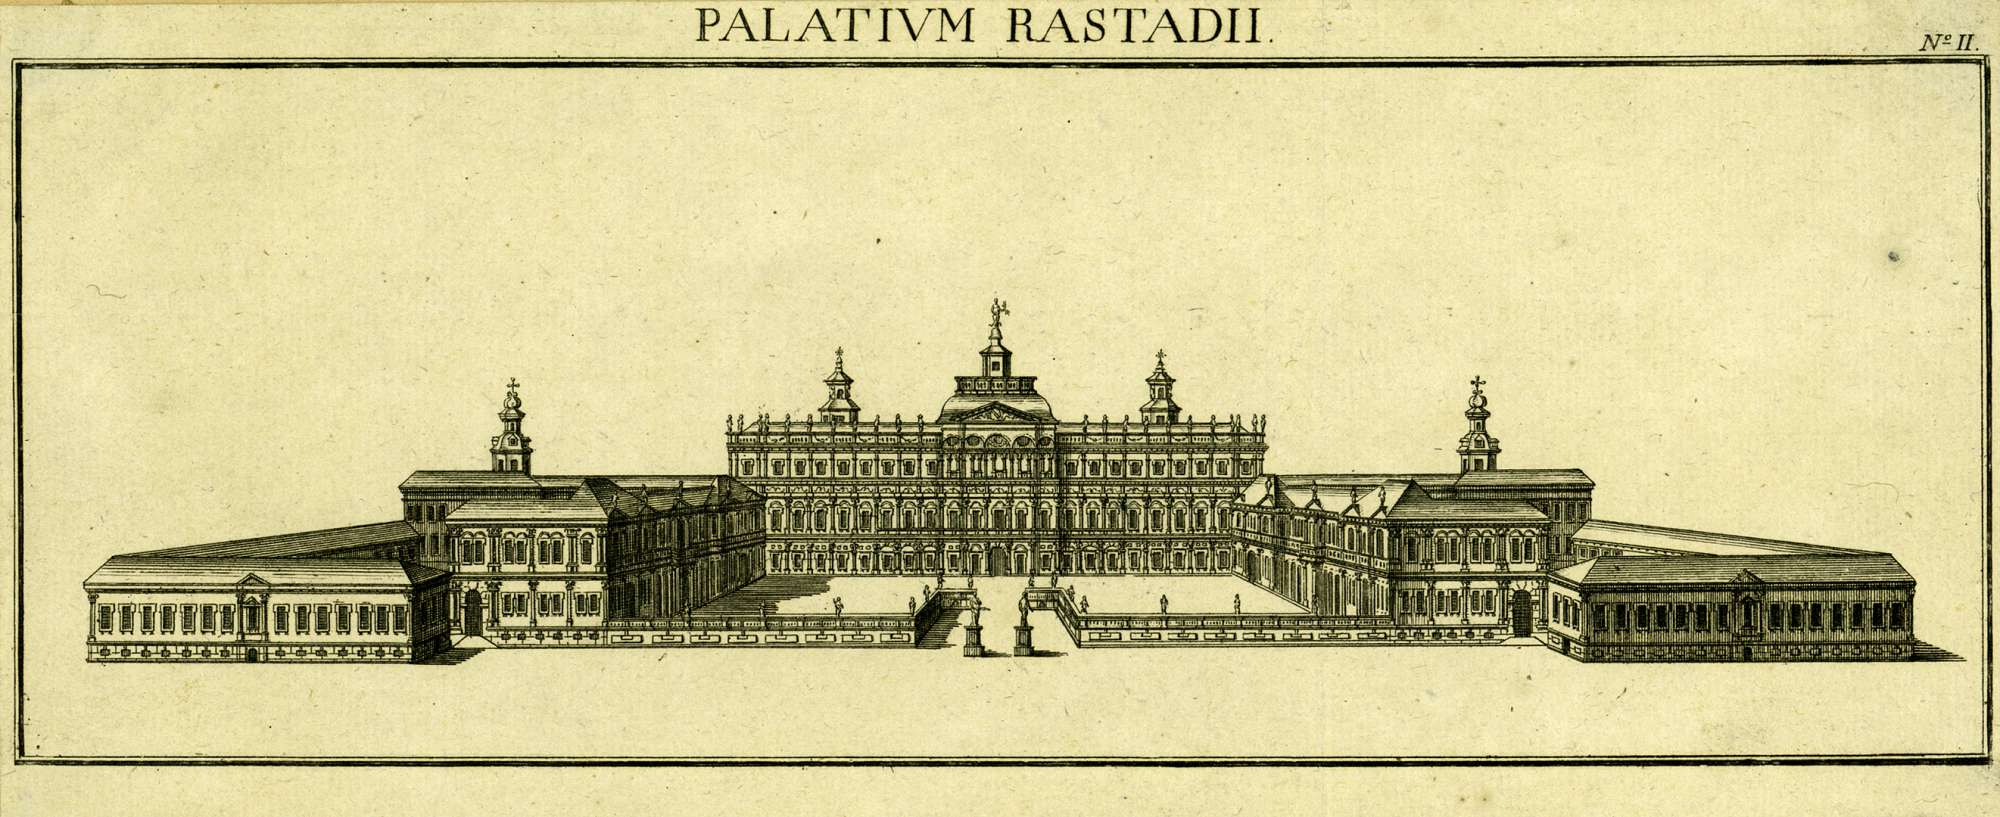 Palatium Rastadii, Bild 1